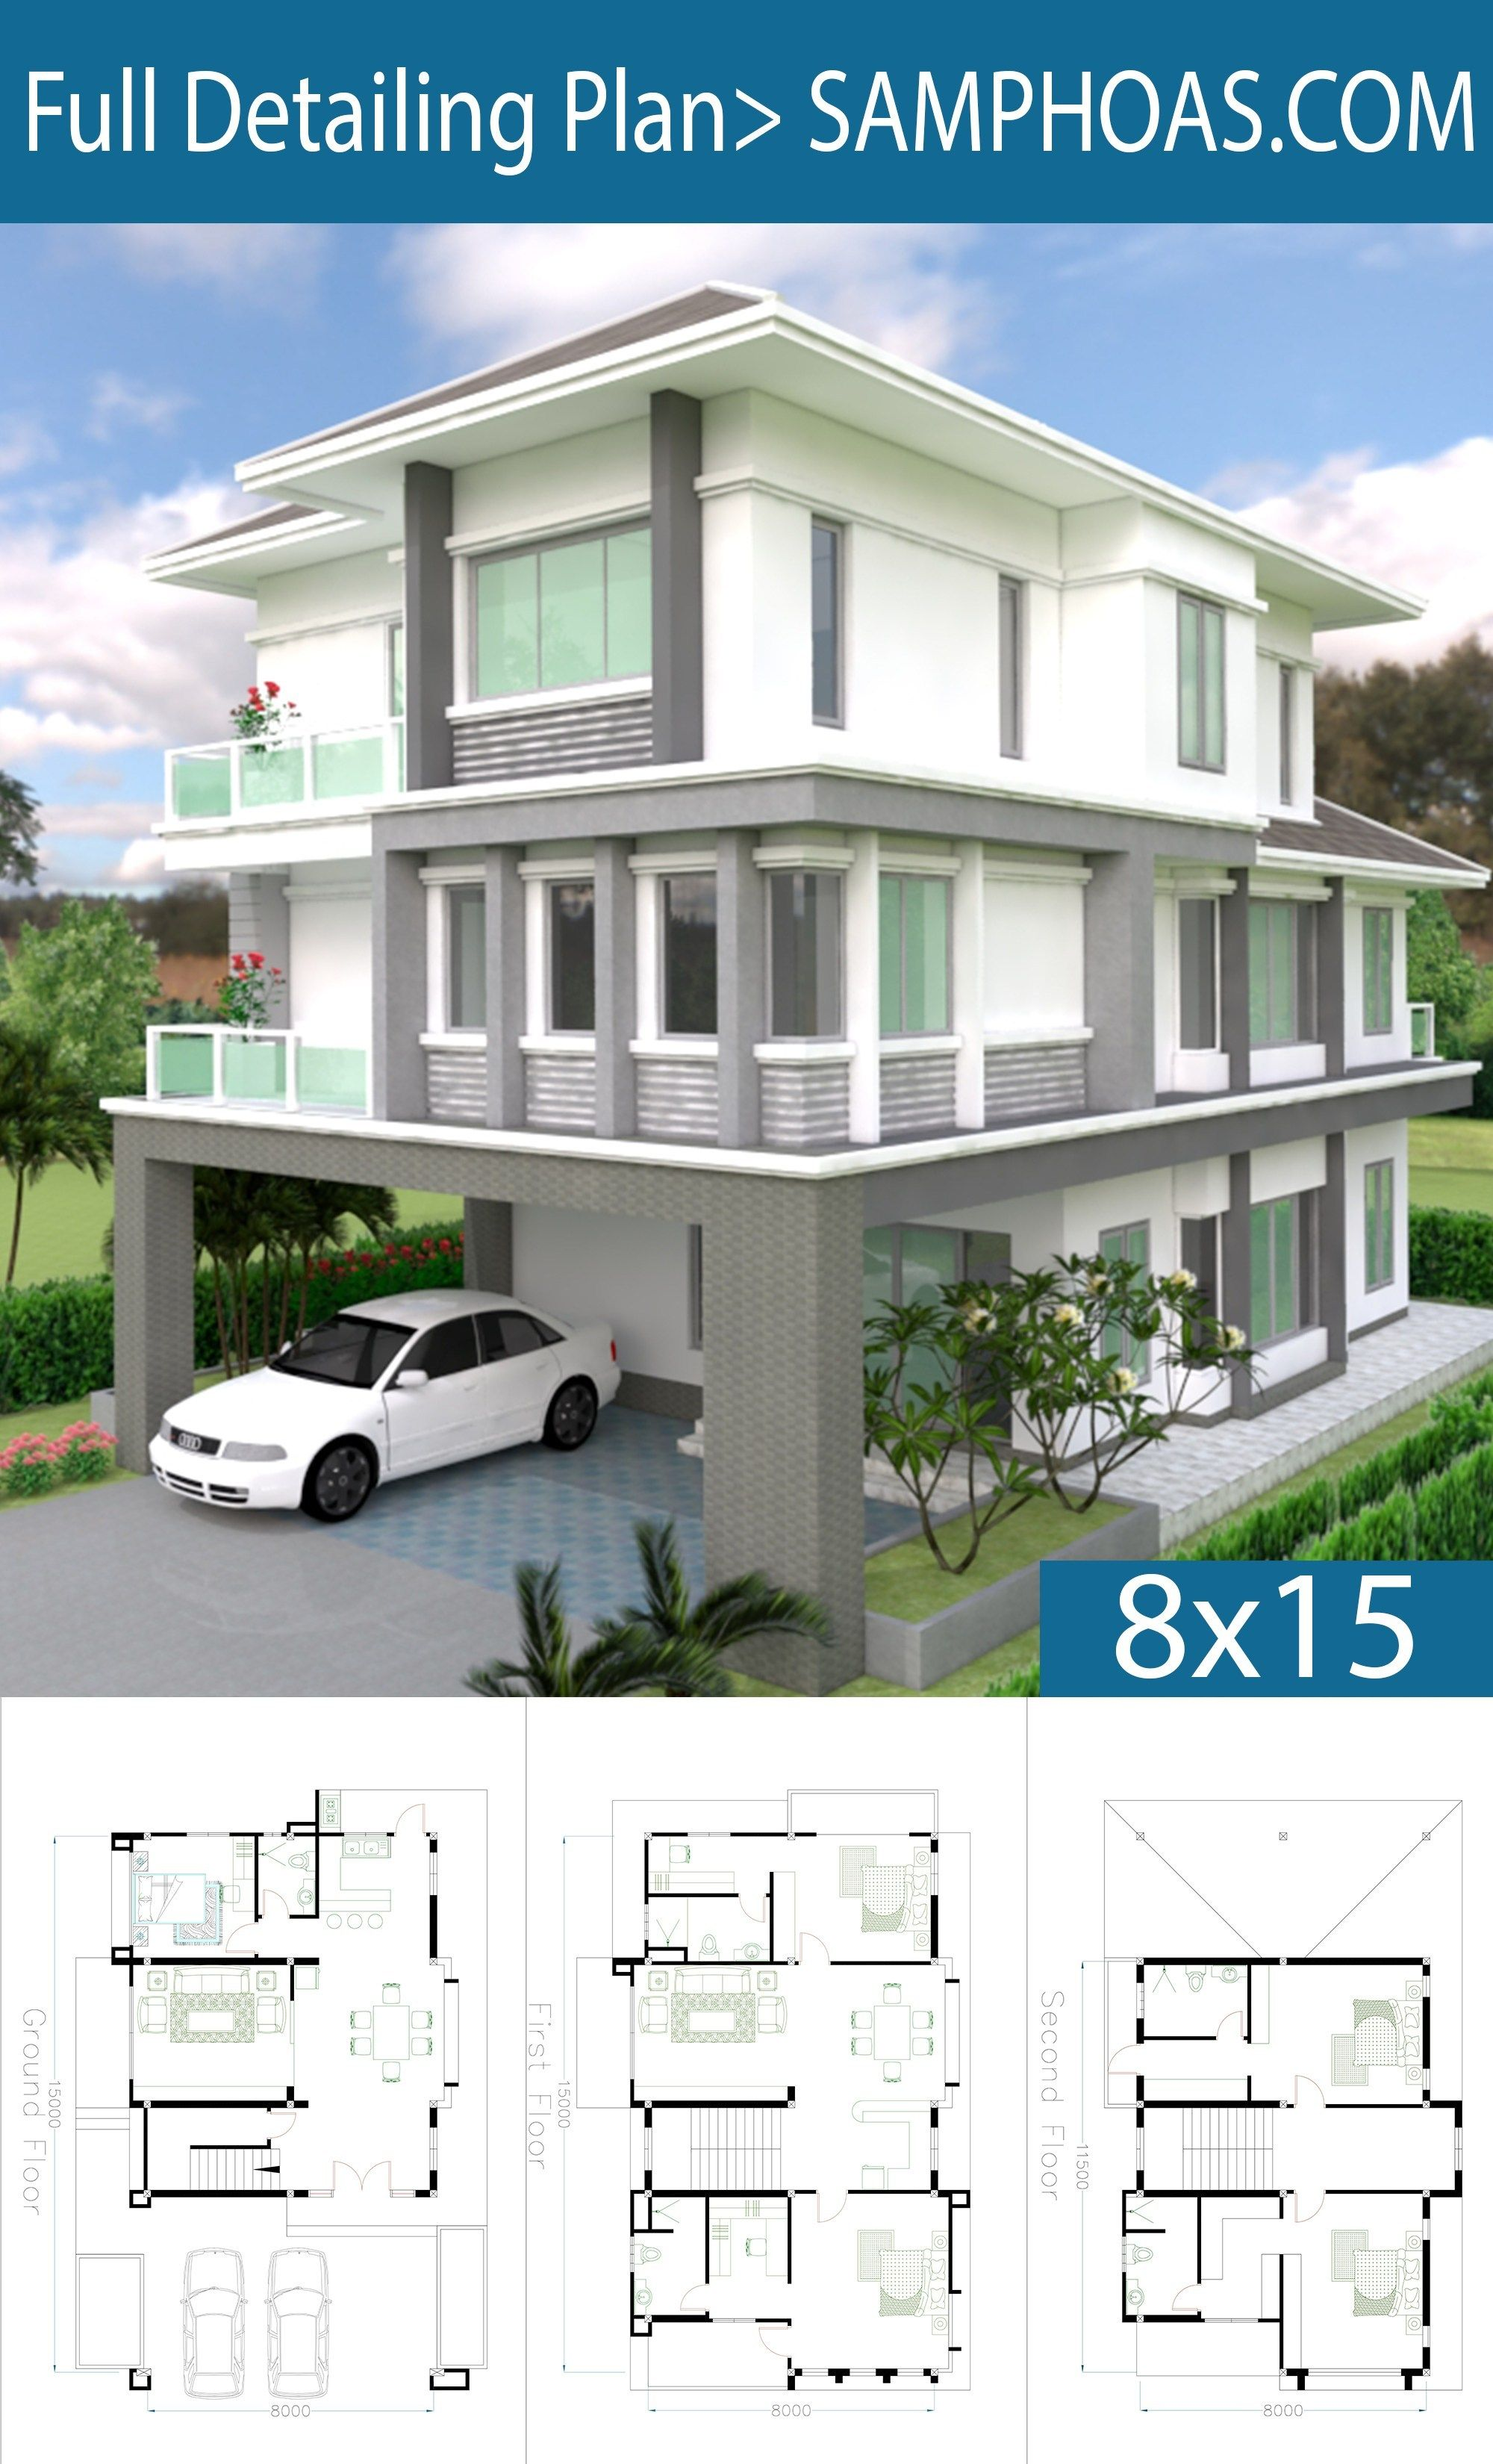 Sketchup 5 Bedrooms House Plan 8x15m Samphoas Plan Contemporary House Plans 5 Bedroom House Plans Architecture House